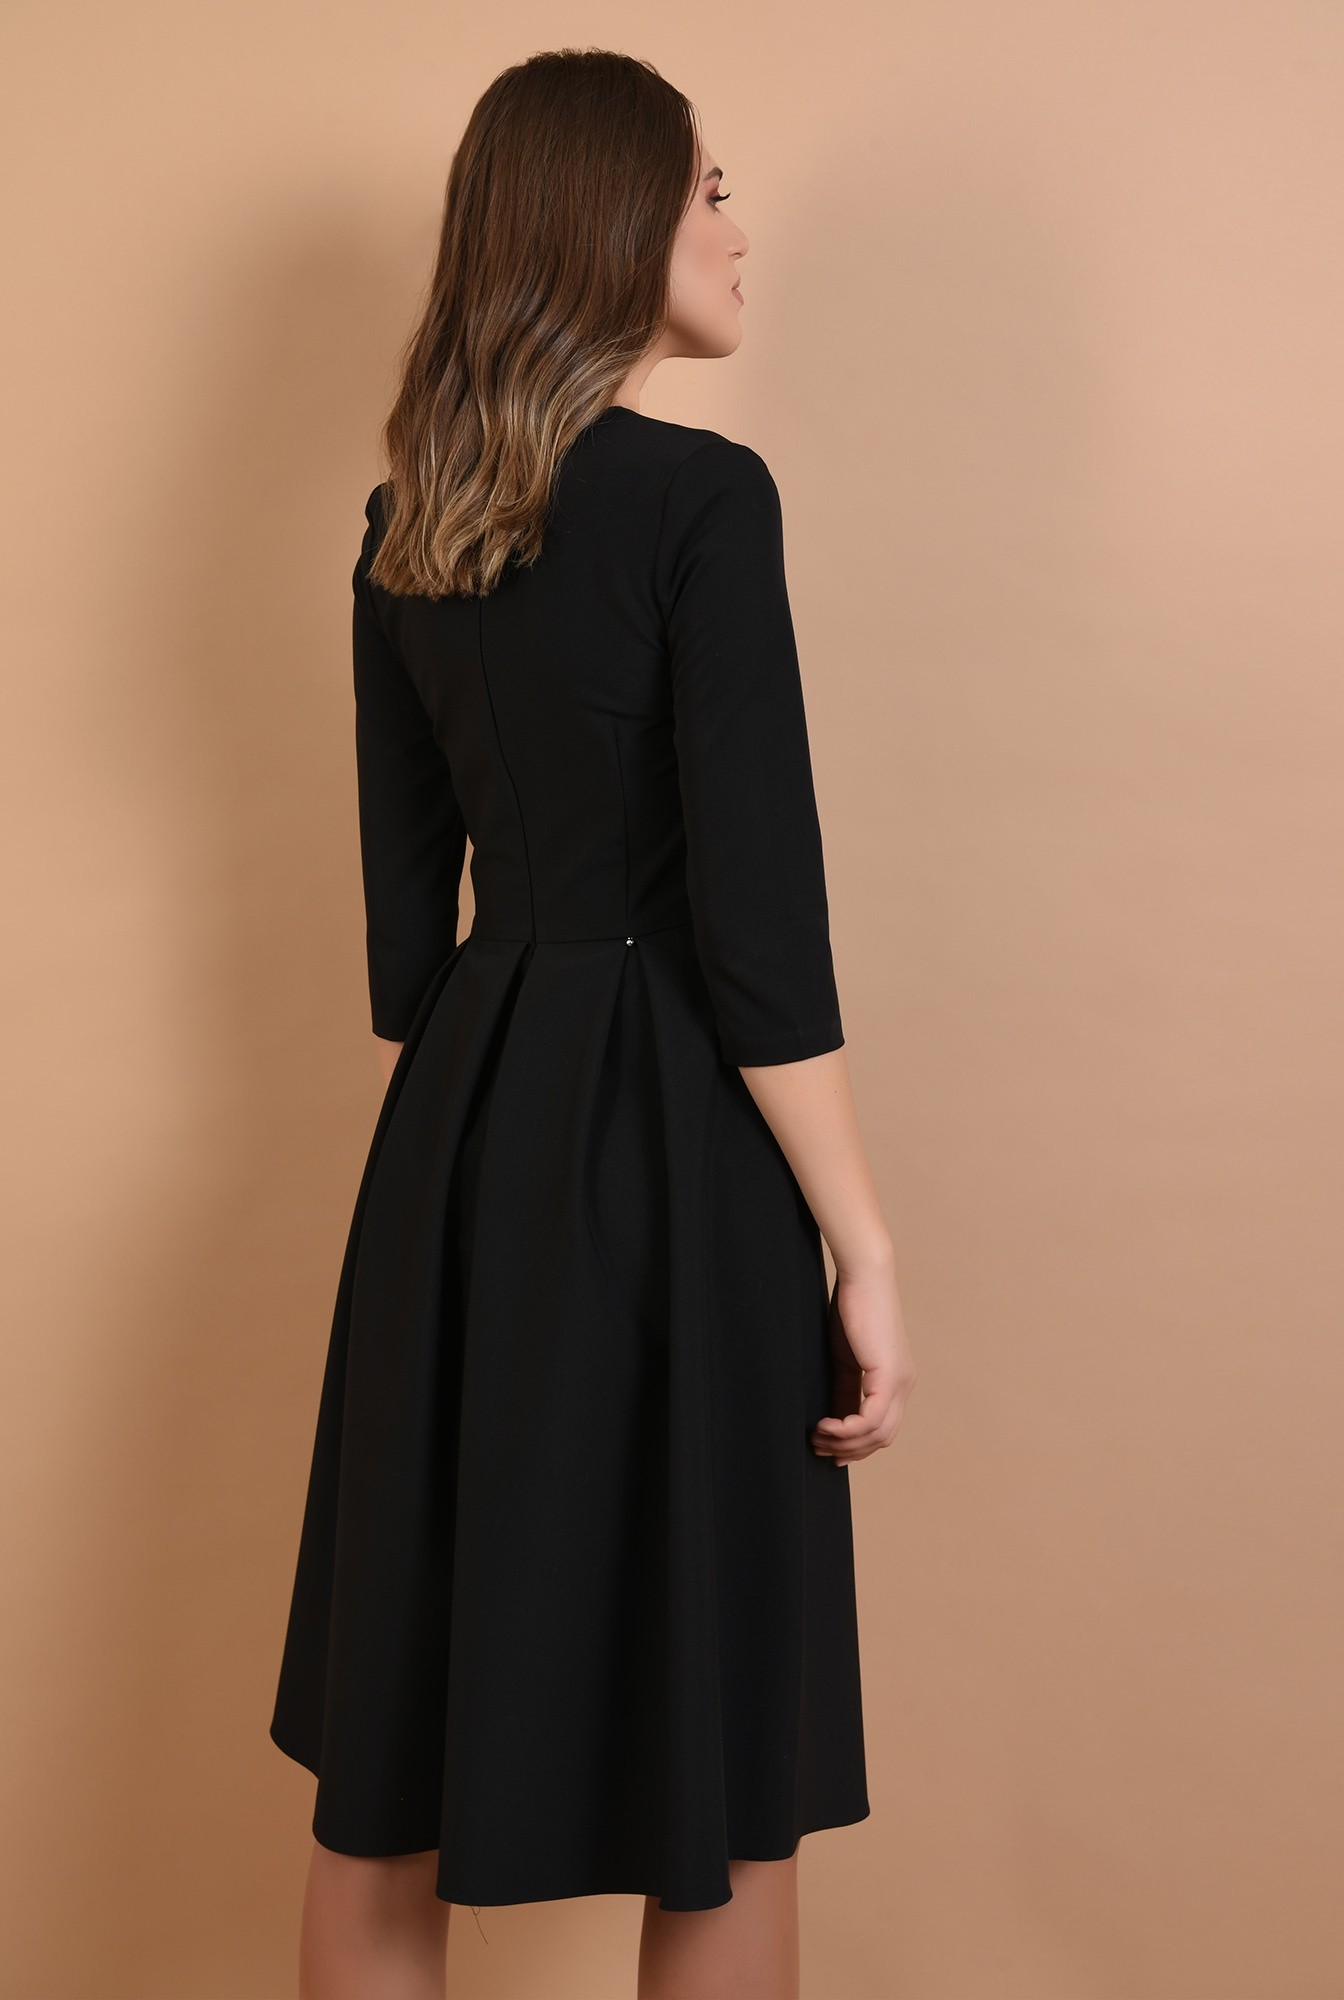 1 - rochie midi, evazata, neagra, cu decolteu acolada, cu pliuri